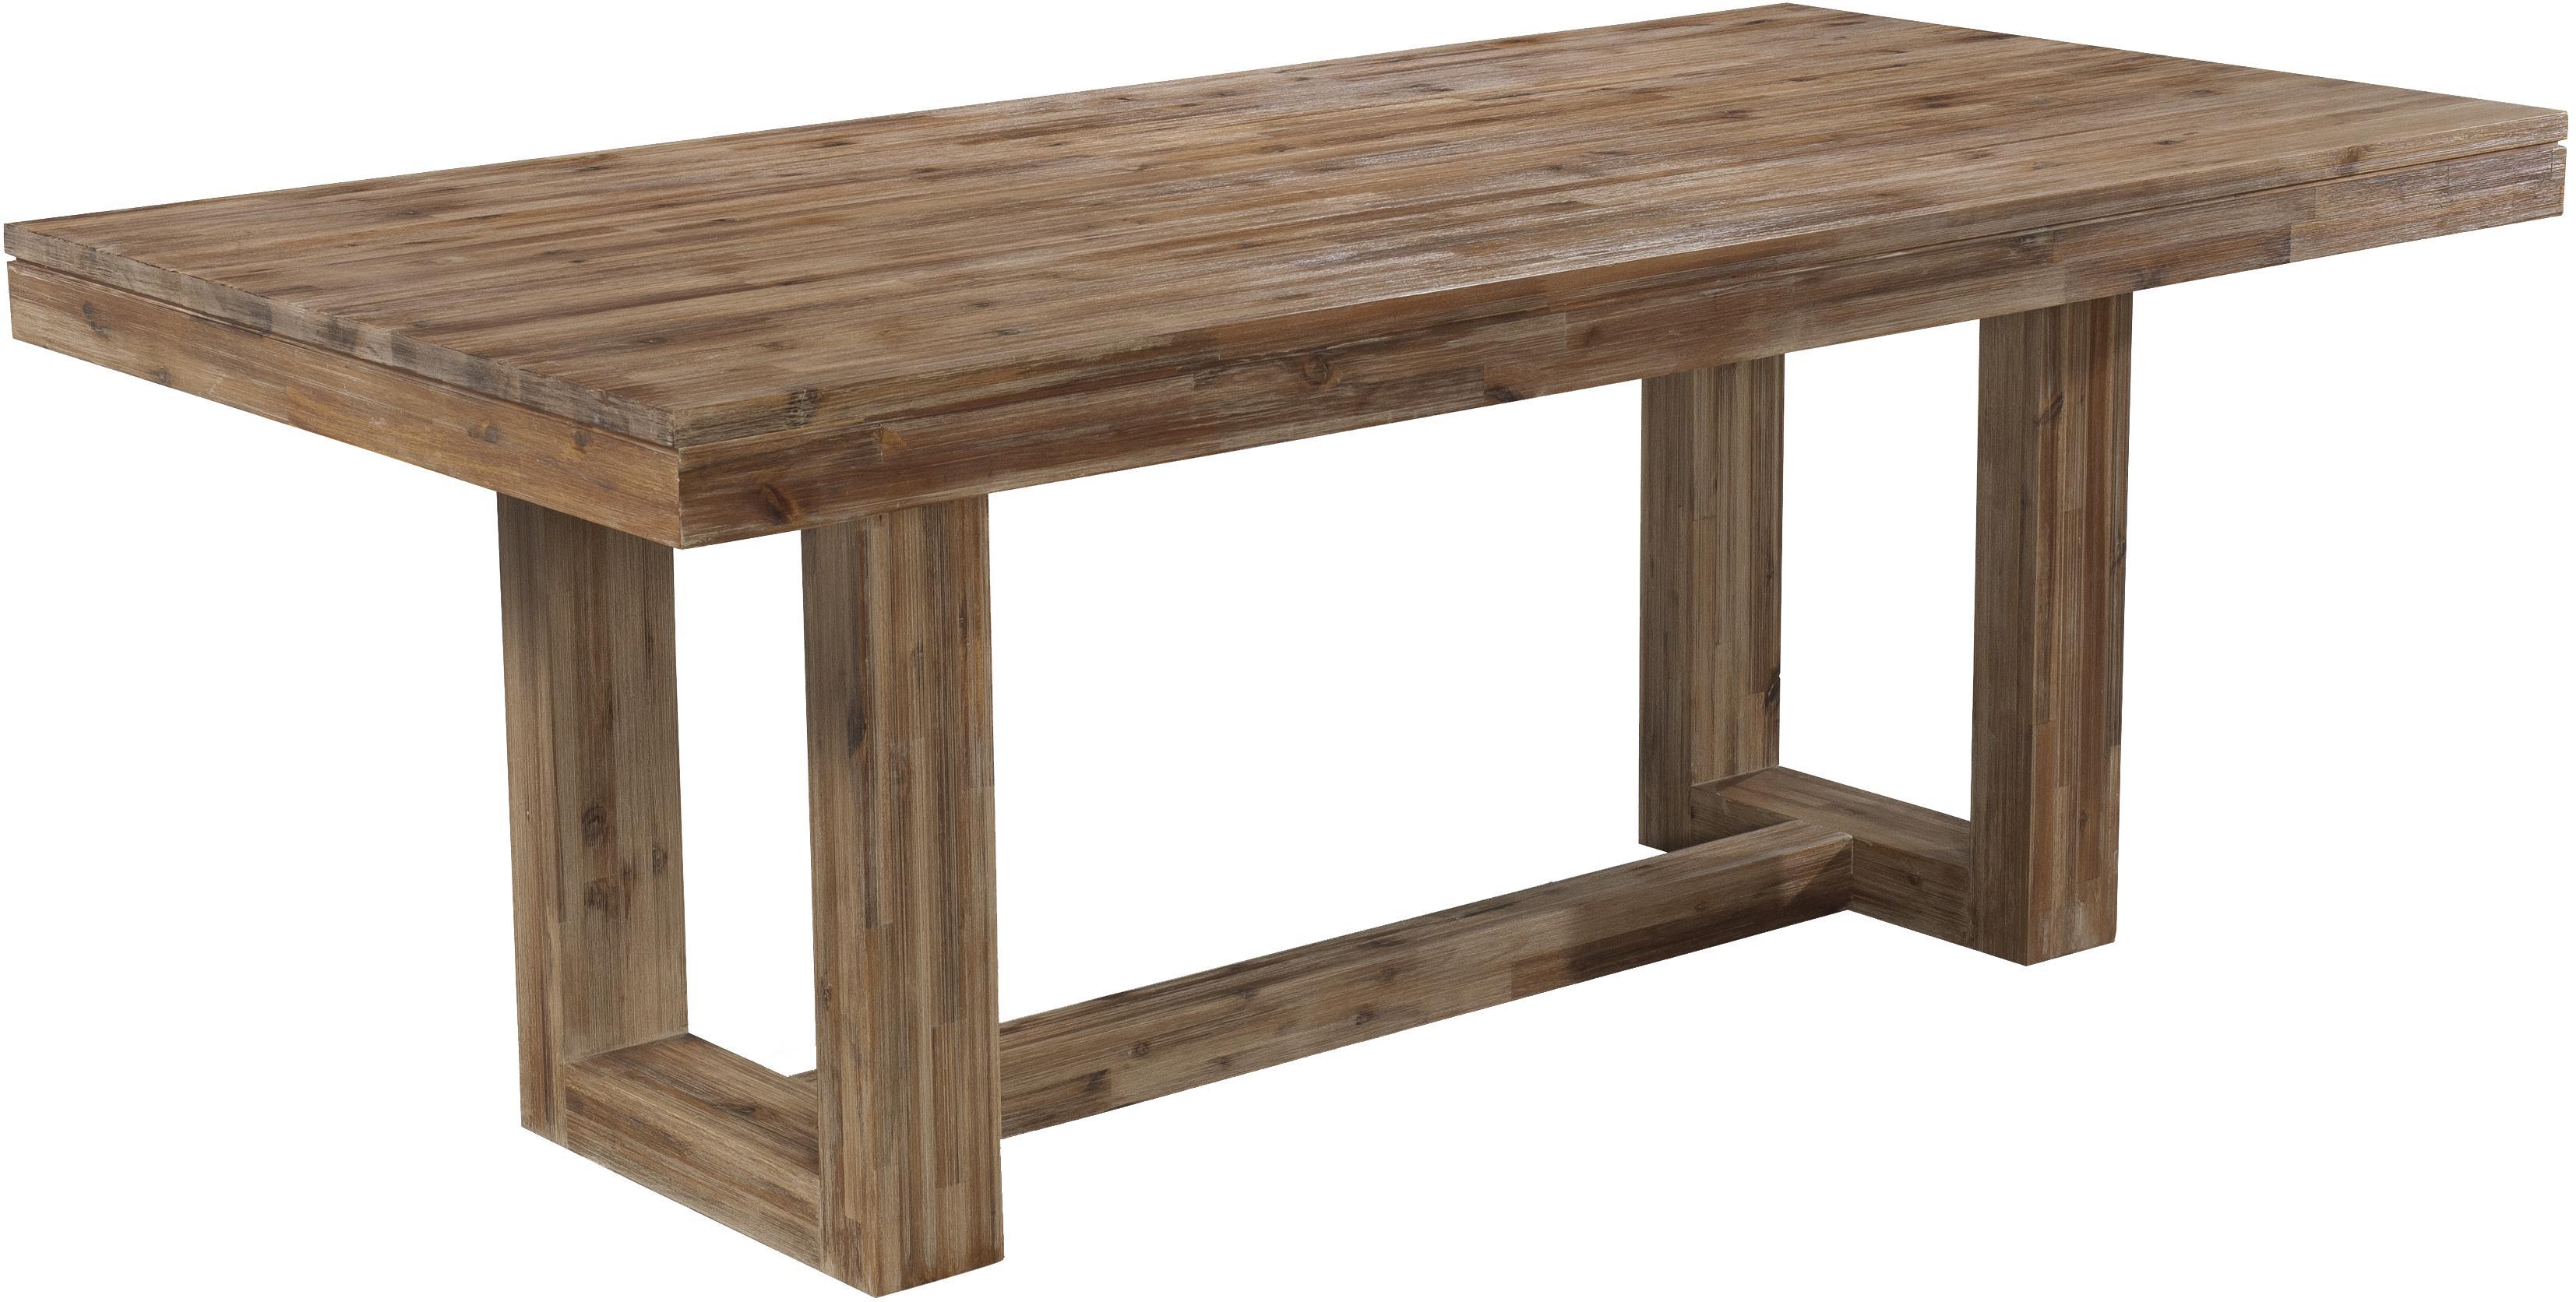 Six-Piece Modern-Rustic Rectangular Trestle Table with Ladderback ...